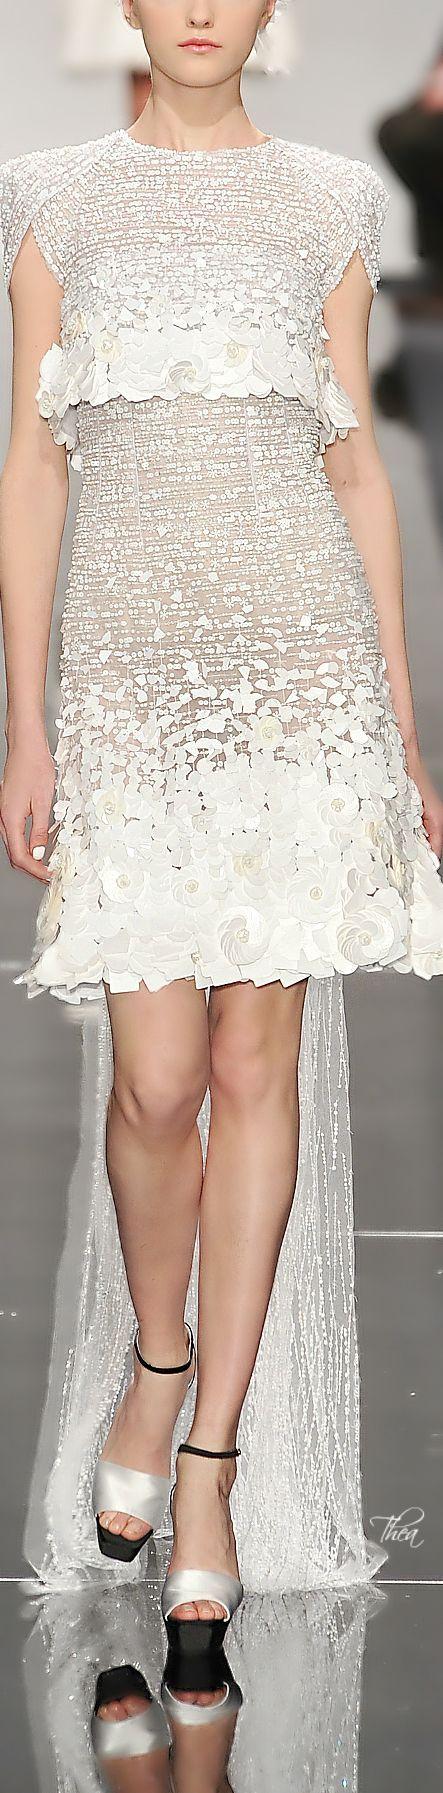 Short Wedding Dresses : Chanel ~ Haute Couture - #Dress https://youfashion.net/wedding/dress/short-wedding-dresses-chanel-haute-couture/